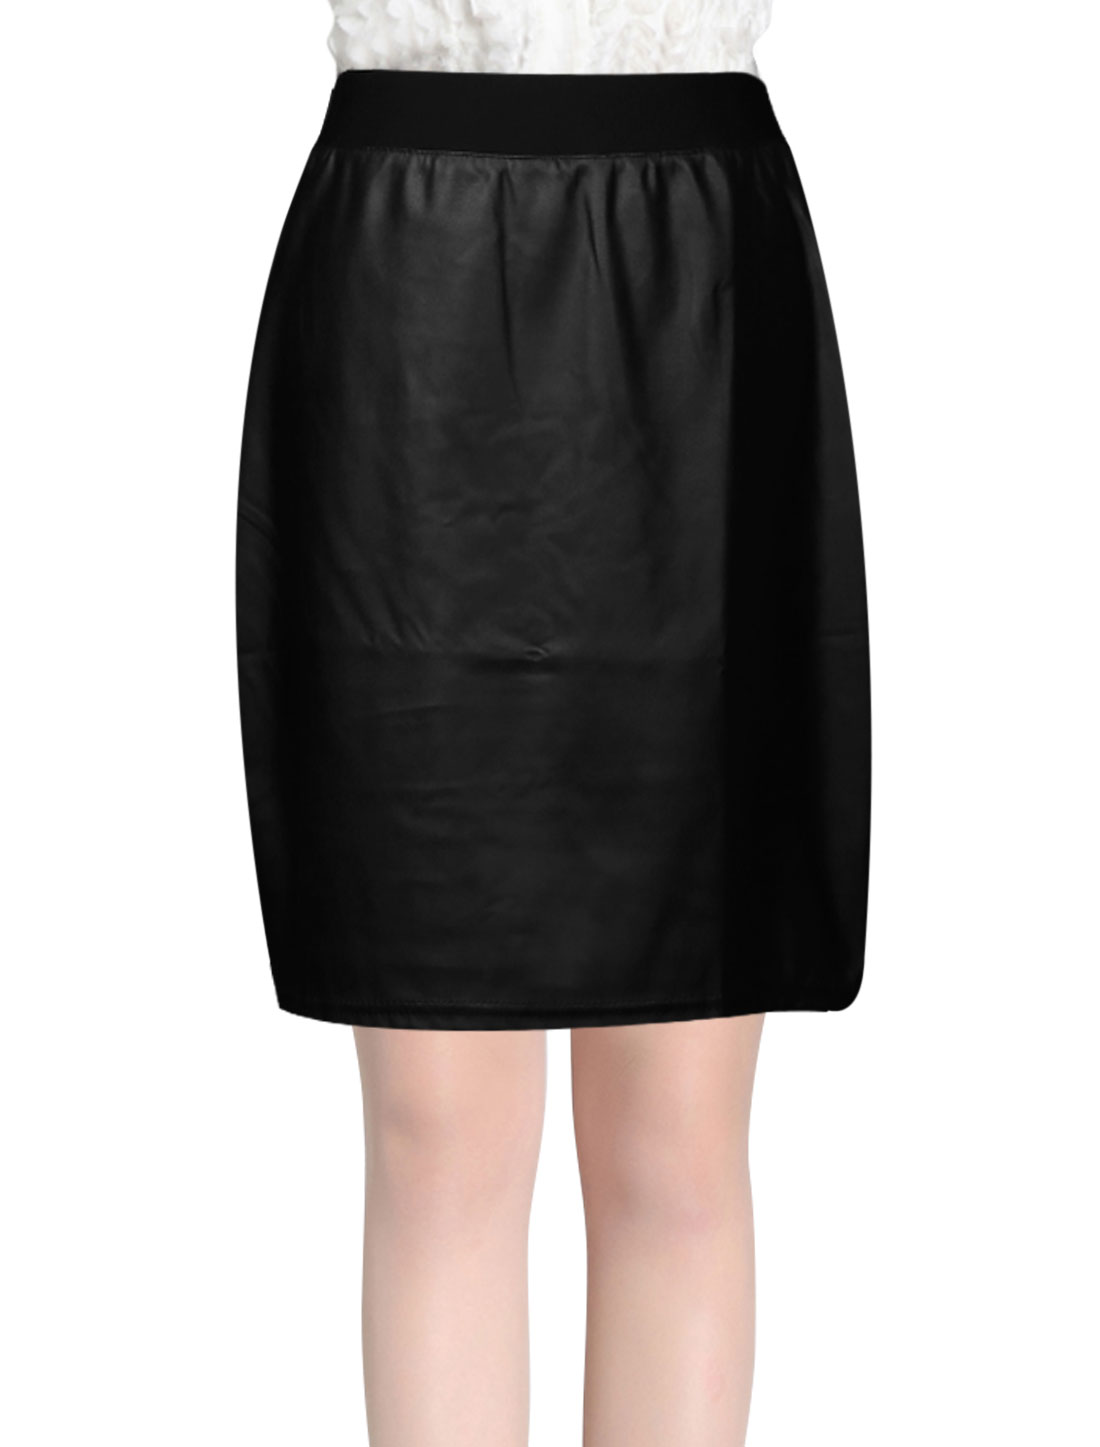 Women Elastic Waist Overhip Imitation Leather Straight Skirt Black L